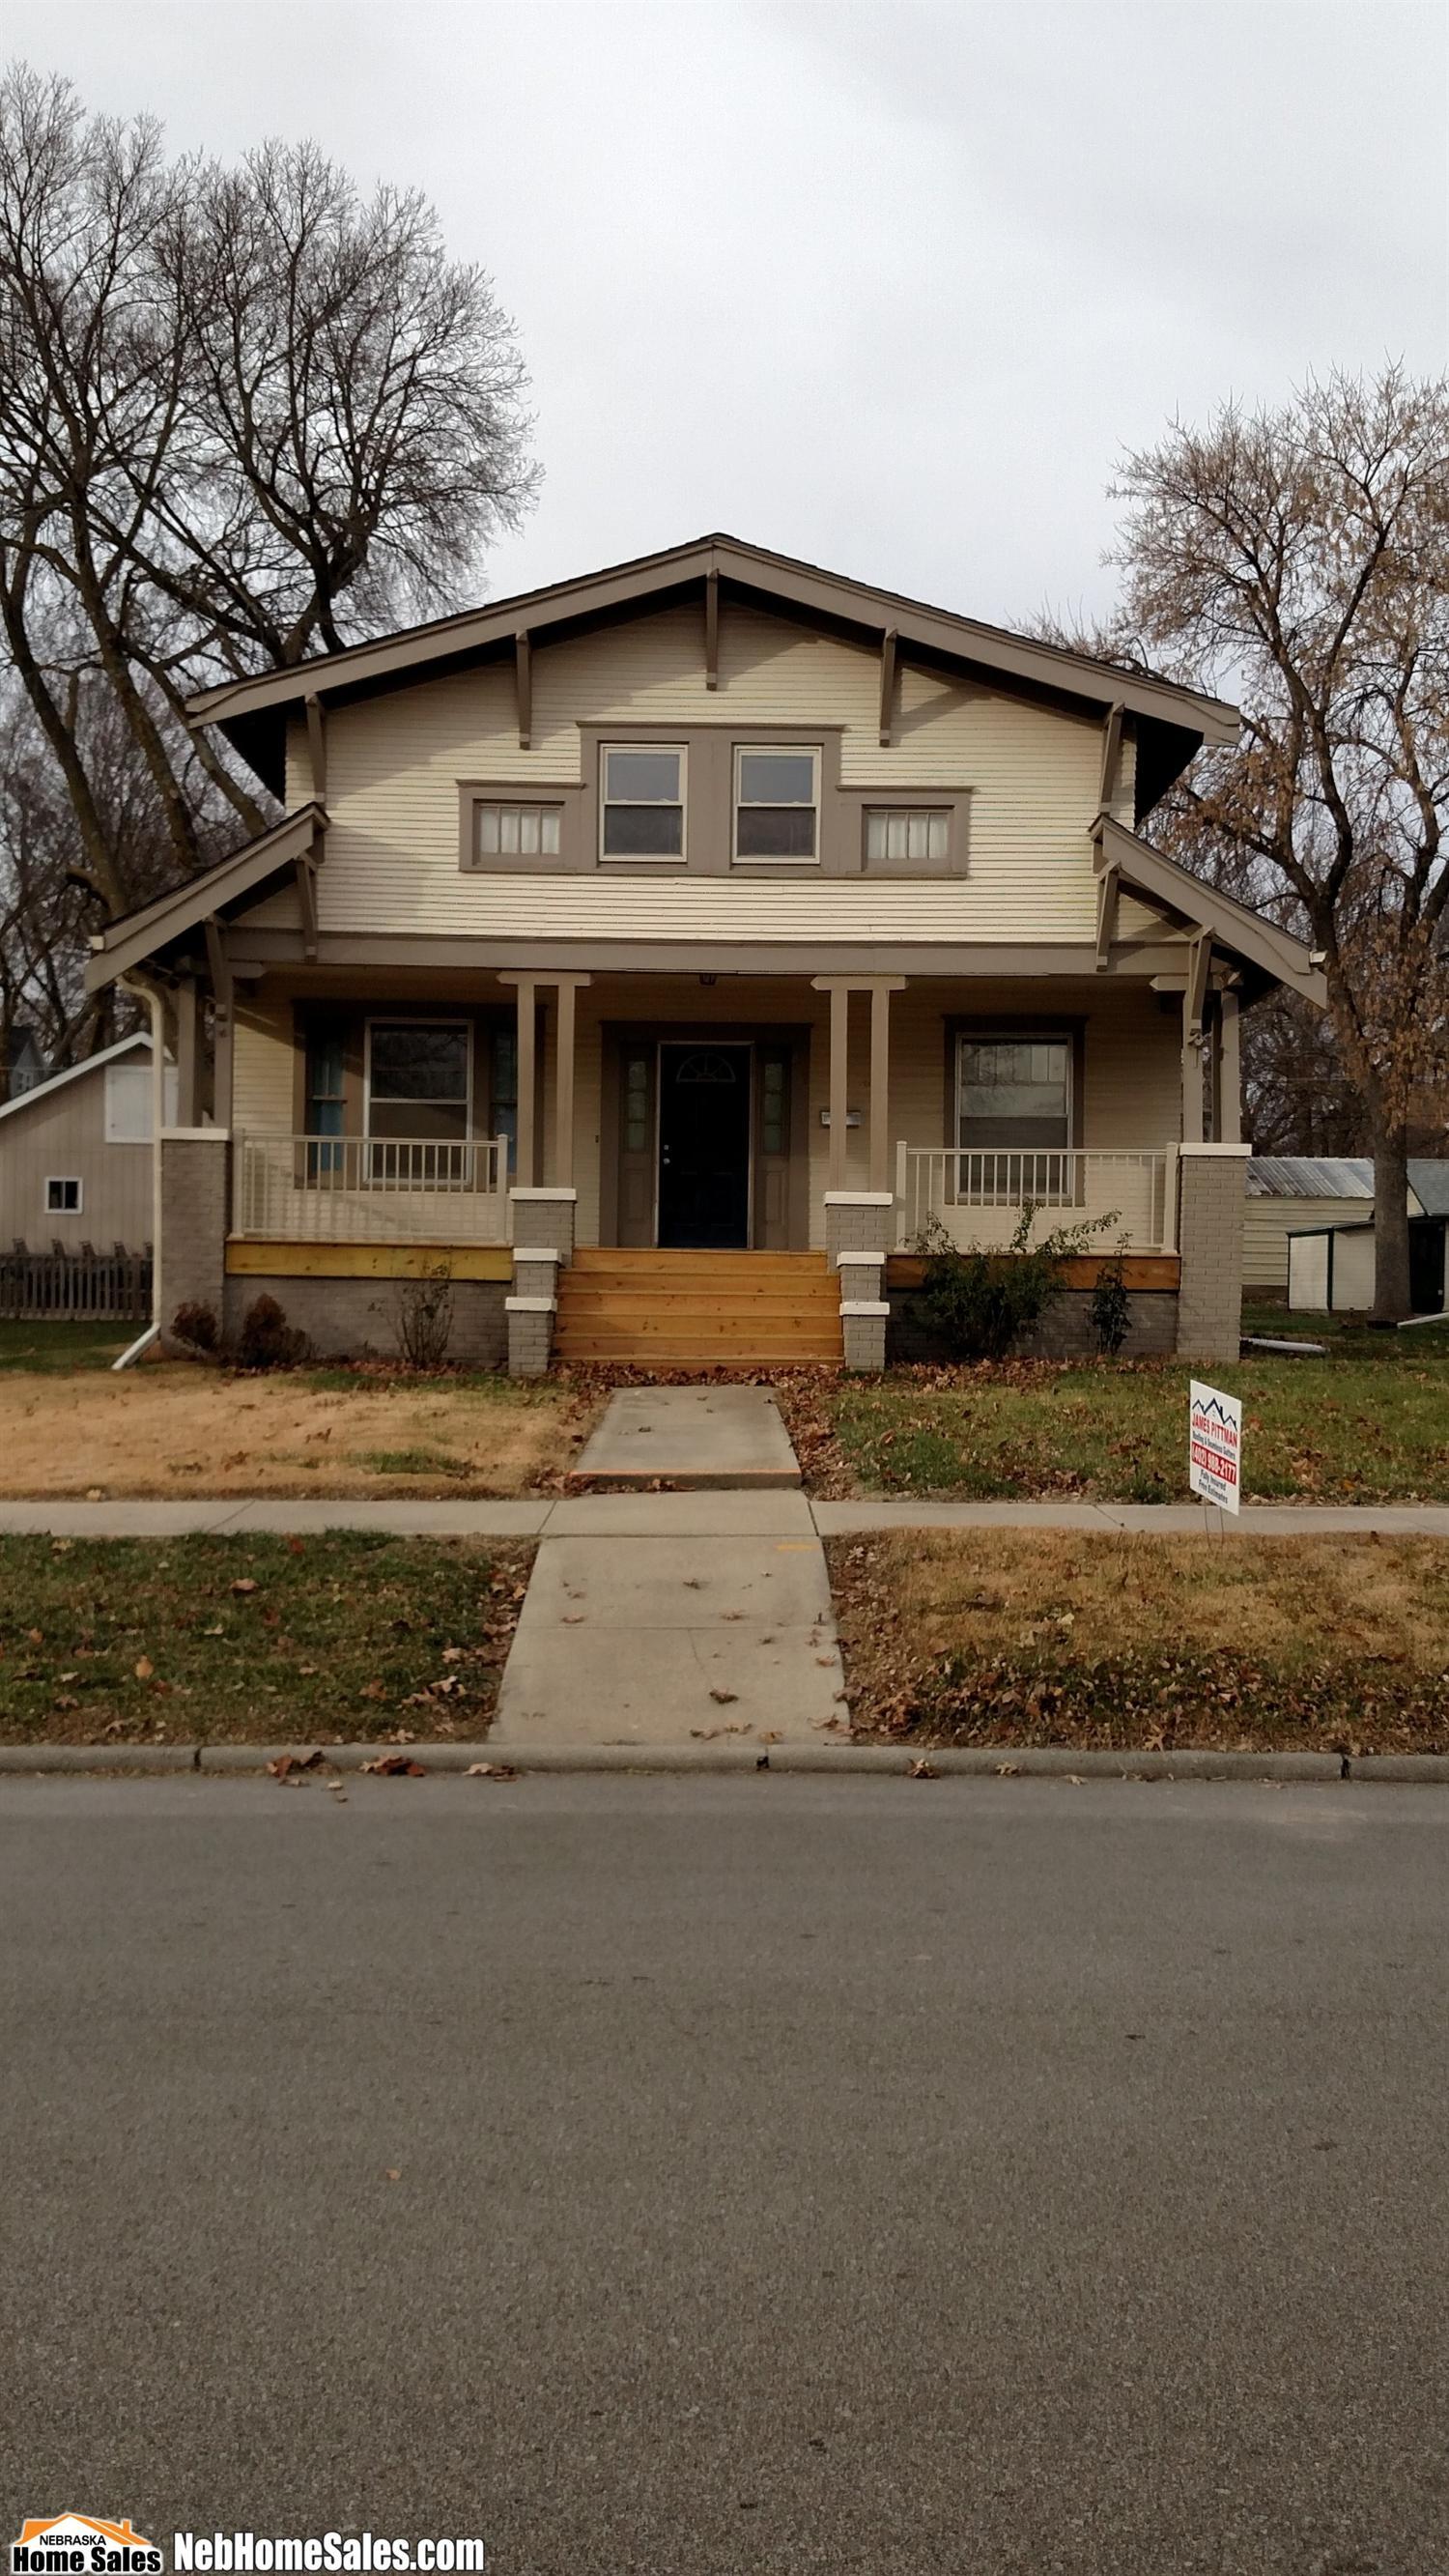 Real Estate for Sale, ListingId: 36587199, Beatrice,NE68310